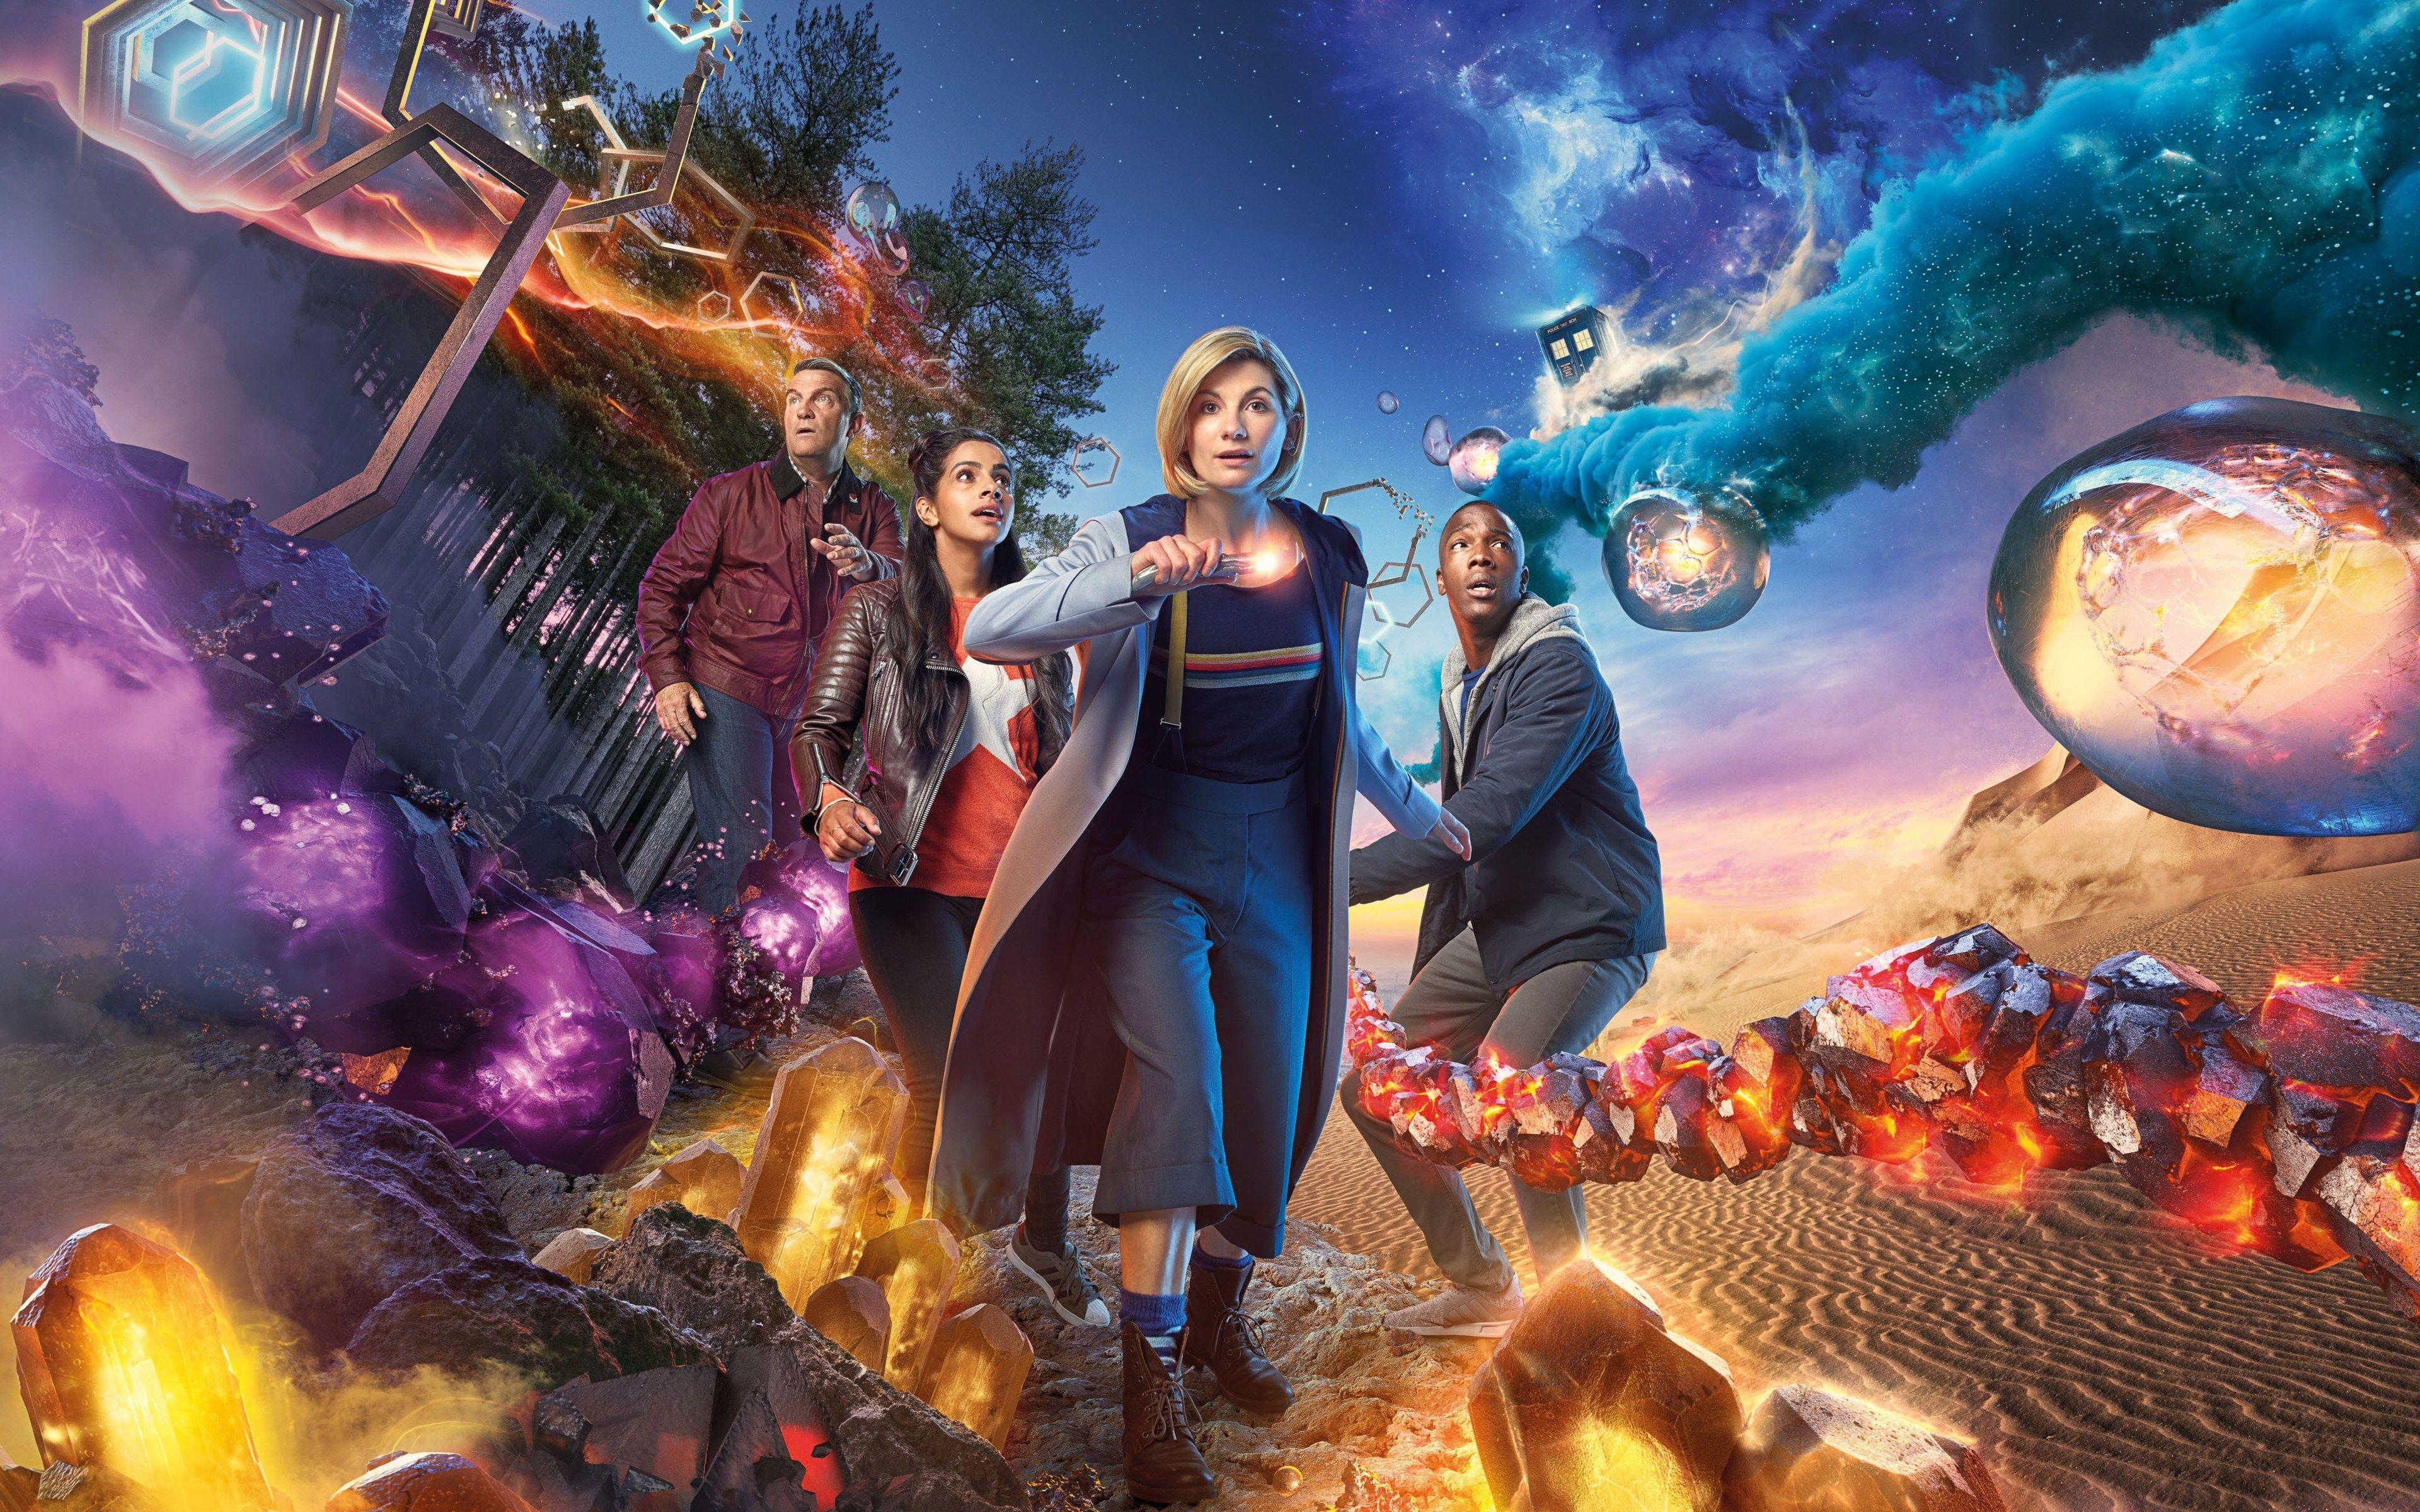 Doctor Who Season 11 4k 2018 4k Wallpaper Doctor Who Season 11